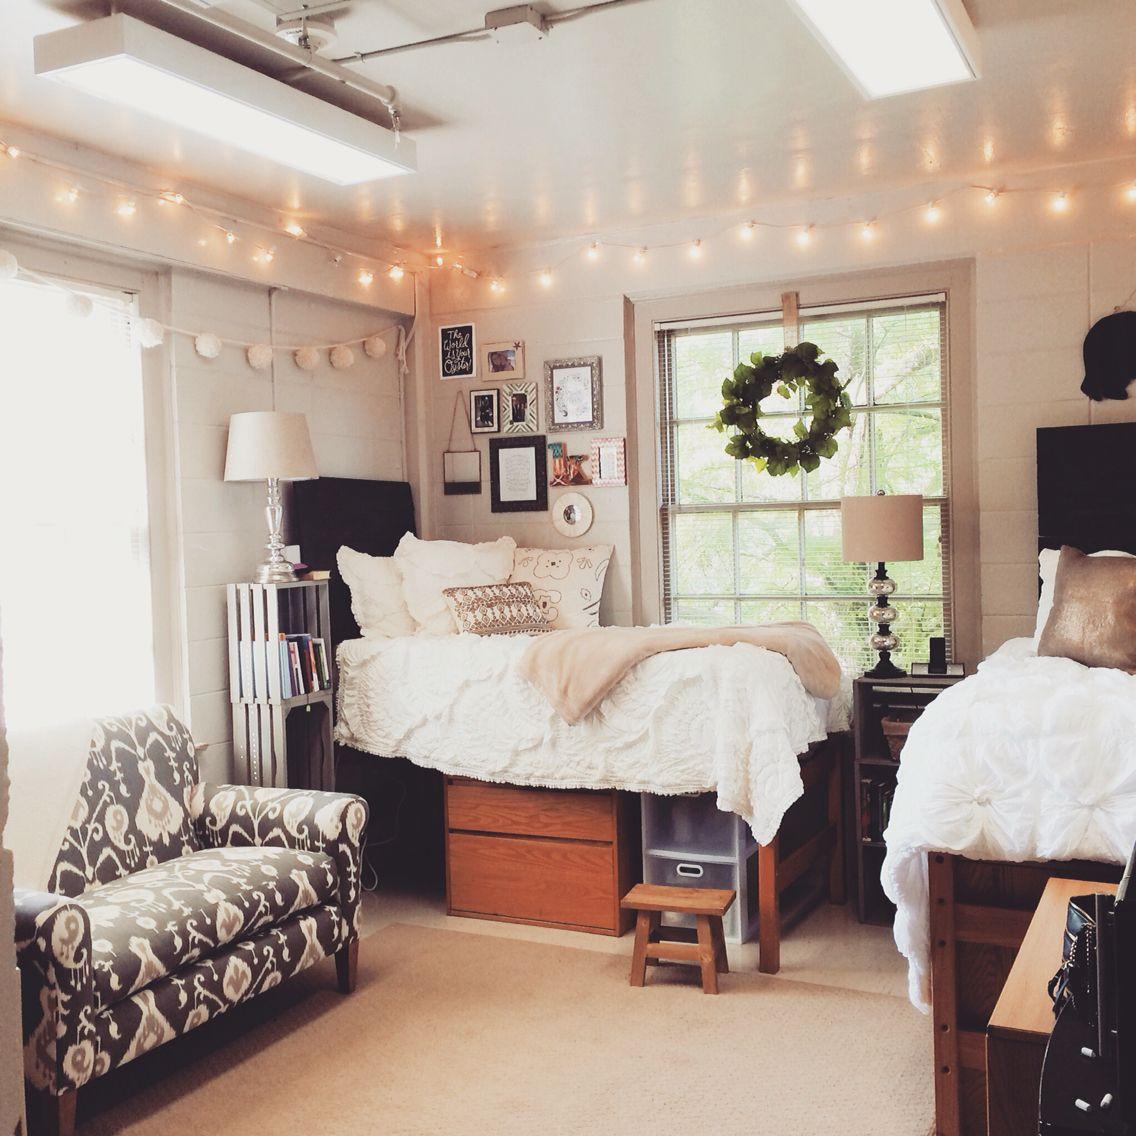 Bed beside window ideas  decoration lavish ideas with nity floating lamp on large cream